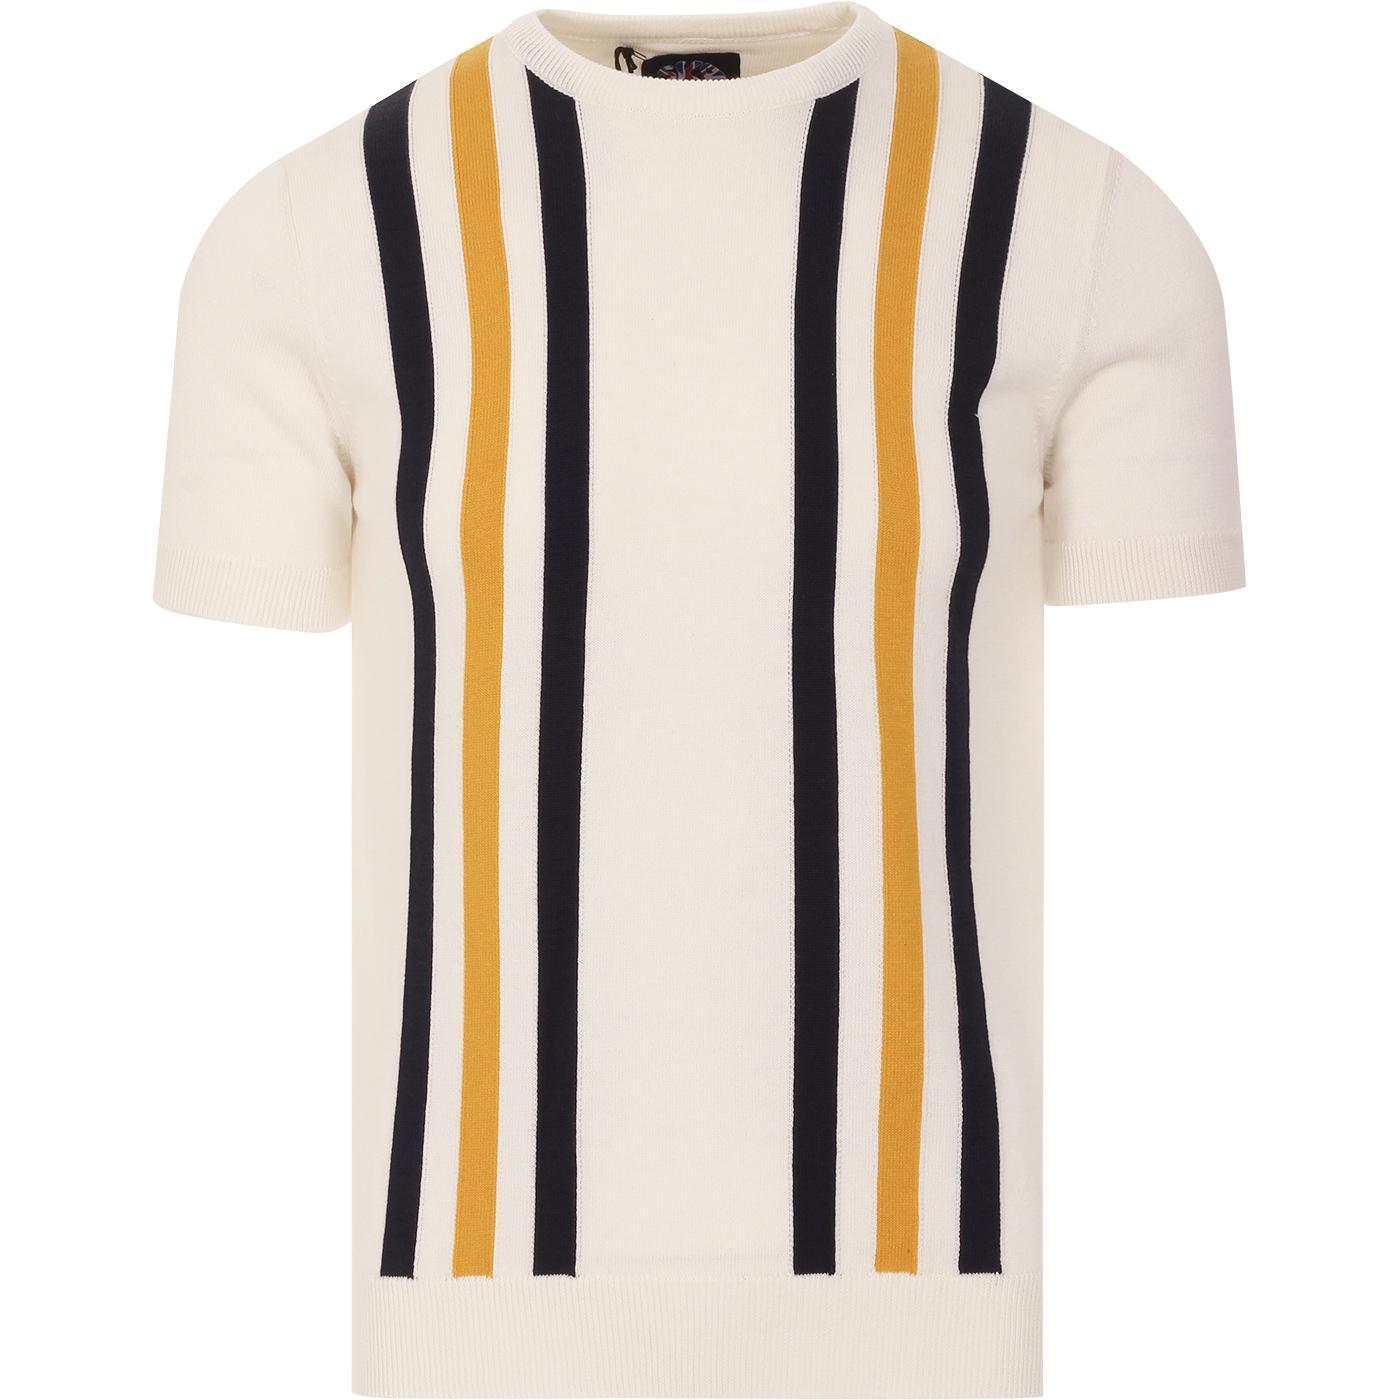 SKA & SOUL 60s Mod Stripe Knitted T-shirt (Ecru)